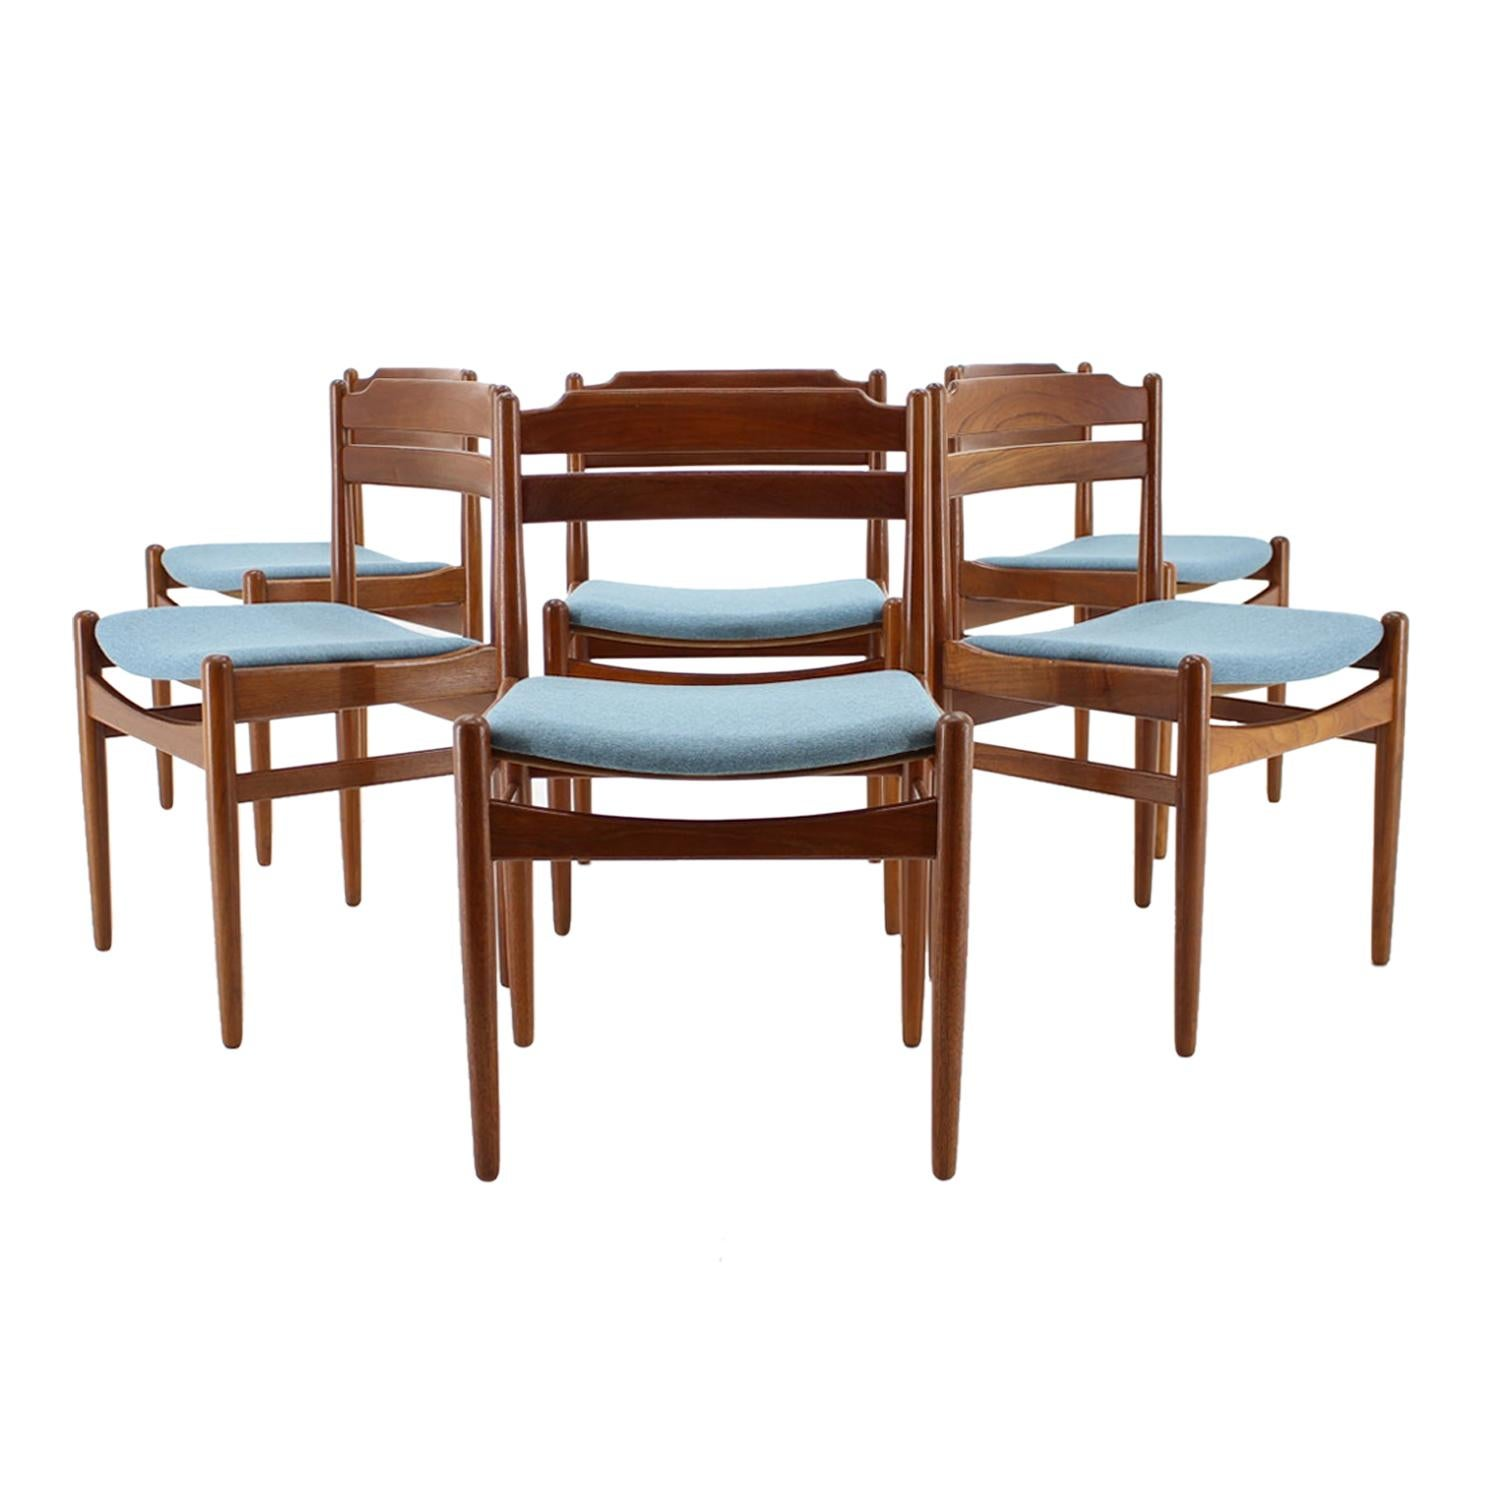 Danish Teak Dining Chairs from Sorø Stolefabrik, 1960s, Set of 6